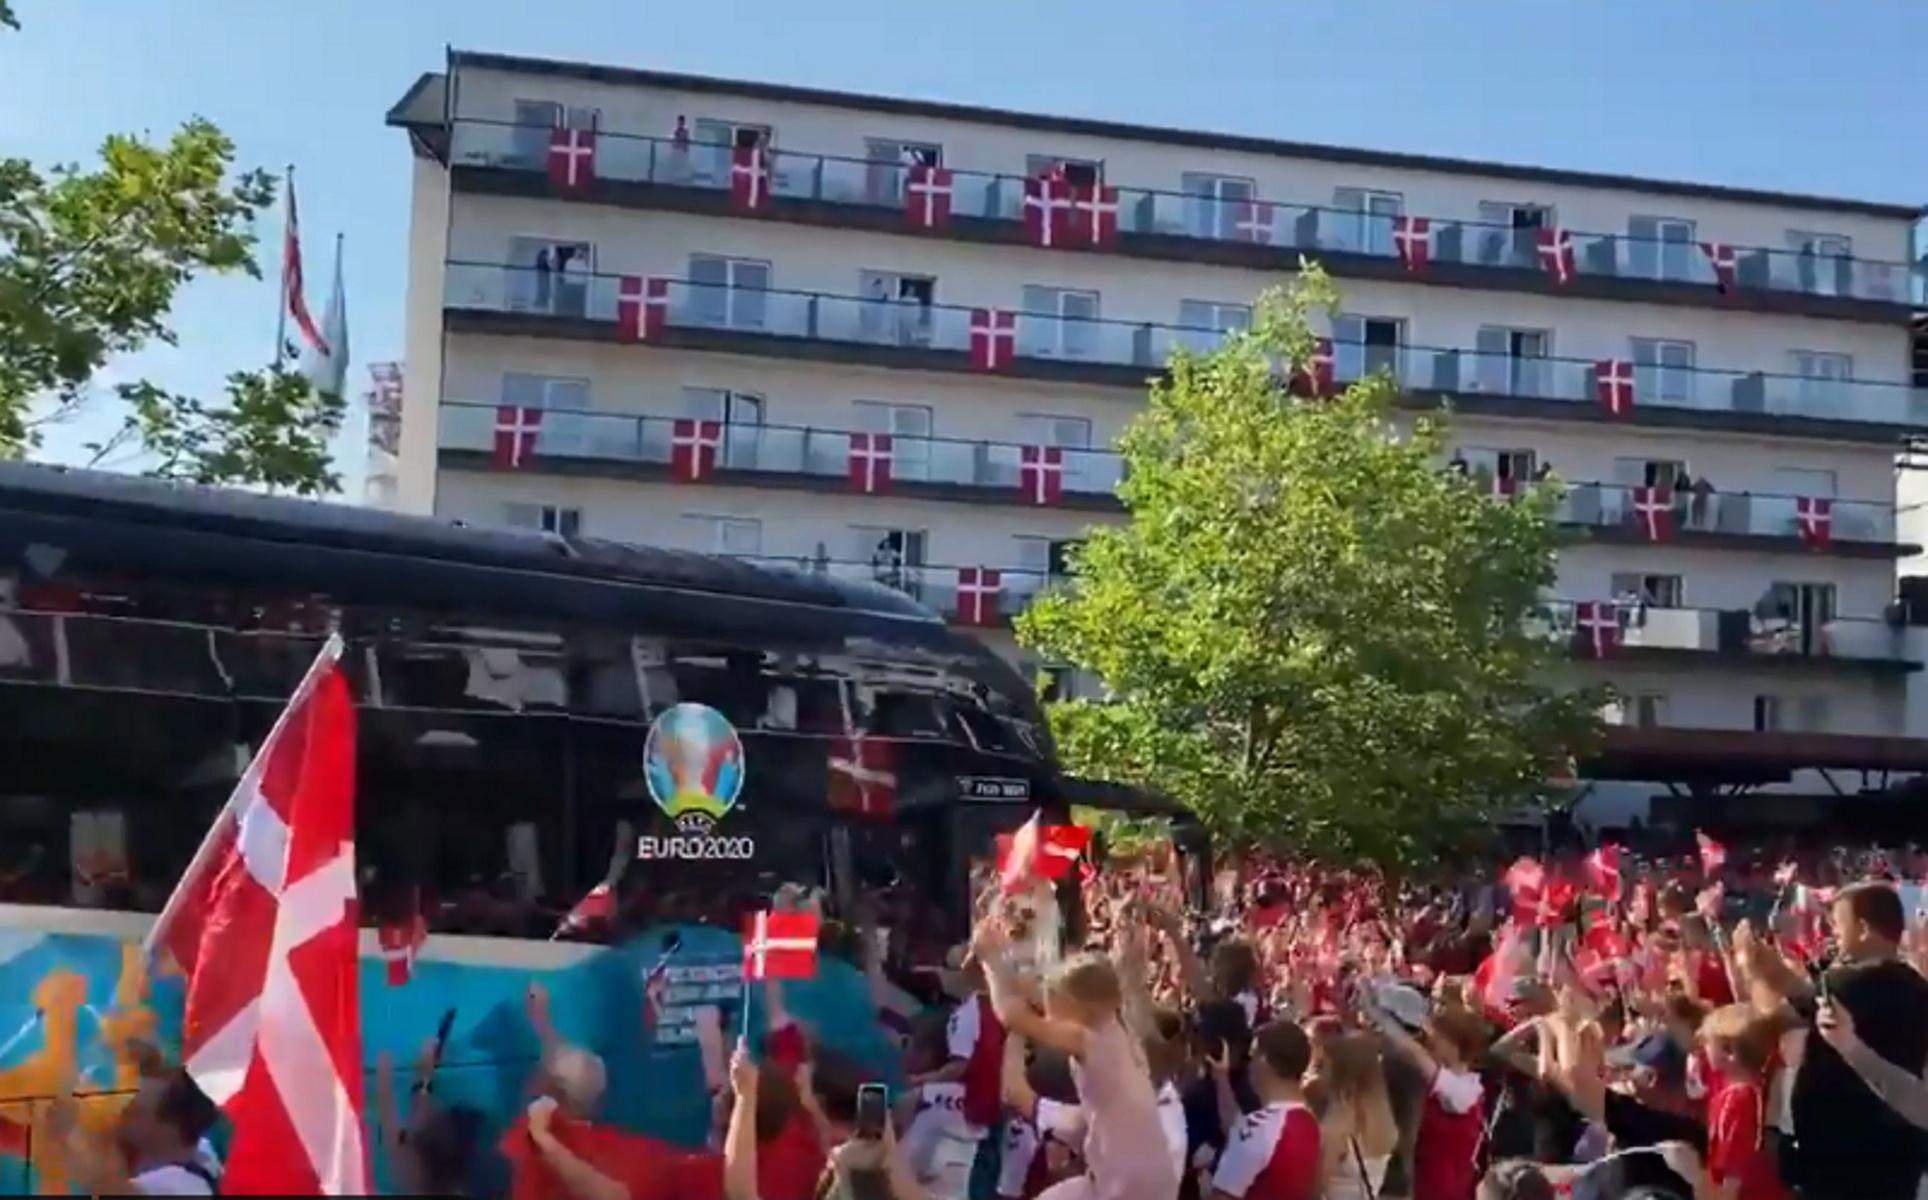 Euro 2020 – Δανία: «Αποθέωση» και σημαίες στα μπαλκόνια πριν τον ημιτελικό με Αγγλία